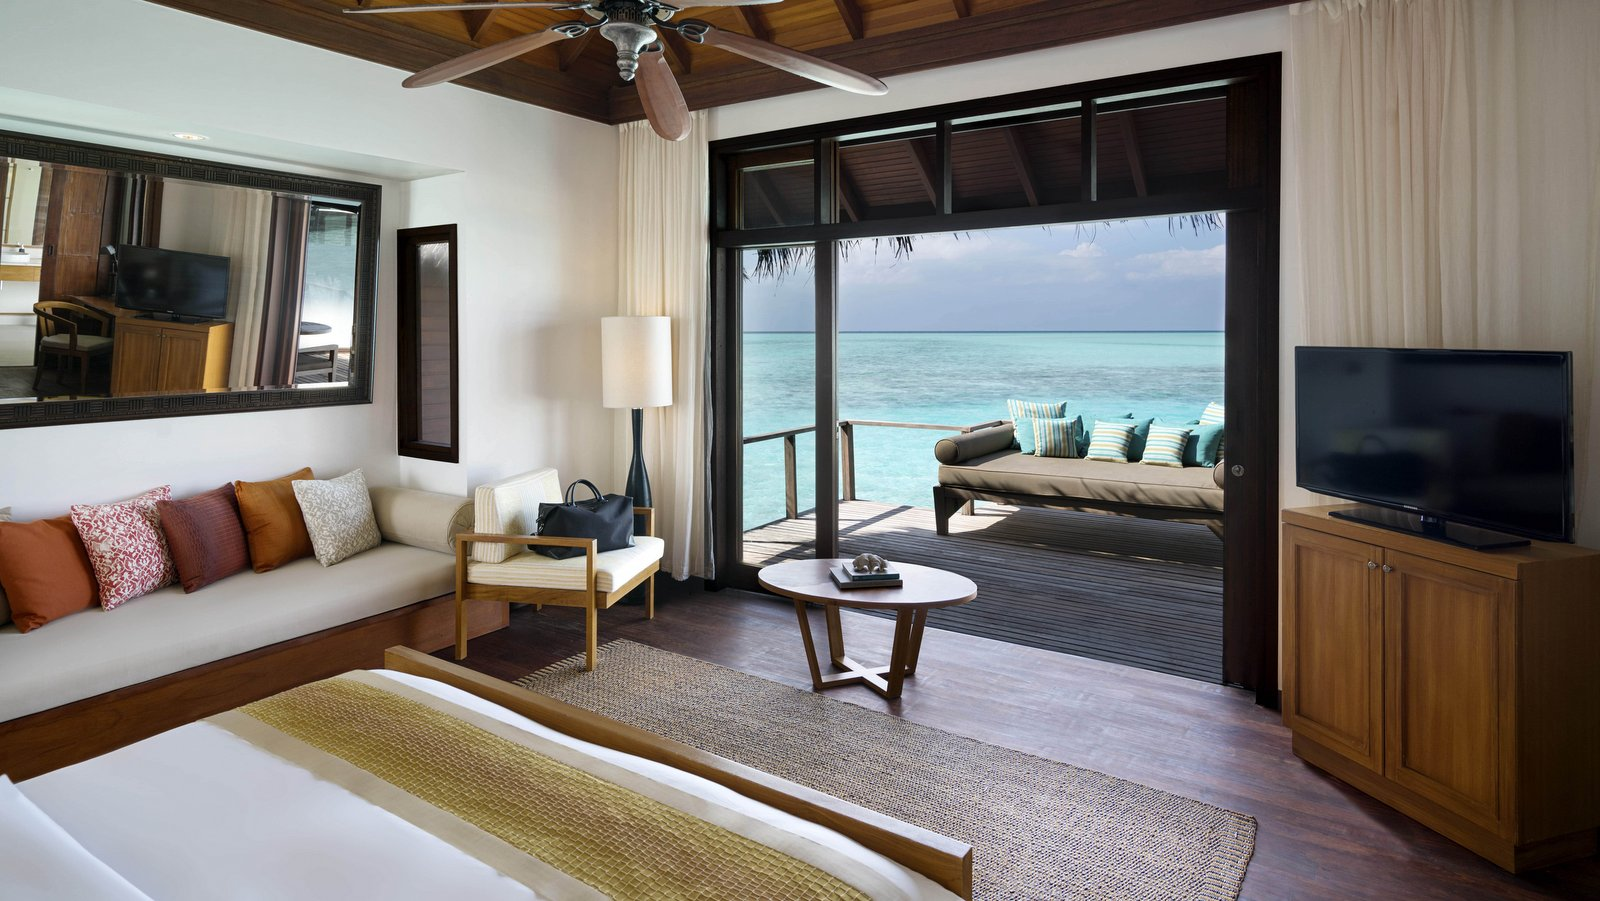 Мальдивы, отель Anantara Veli Resort, номер Deluxe Over Water Bungalow